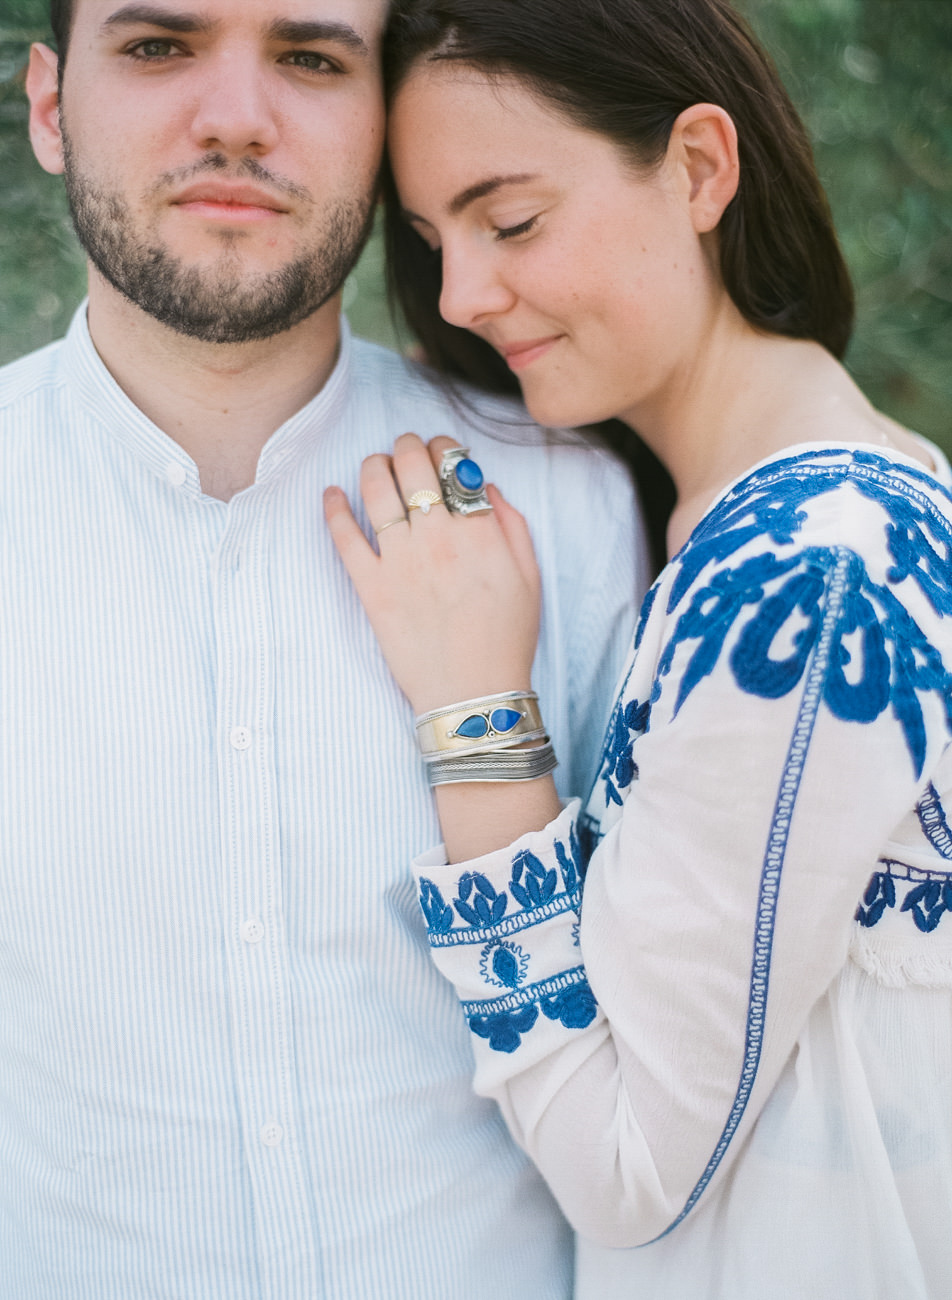 marrakech-photographe-mariage-alain-m-50.jpg